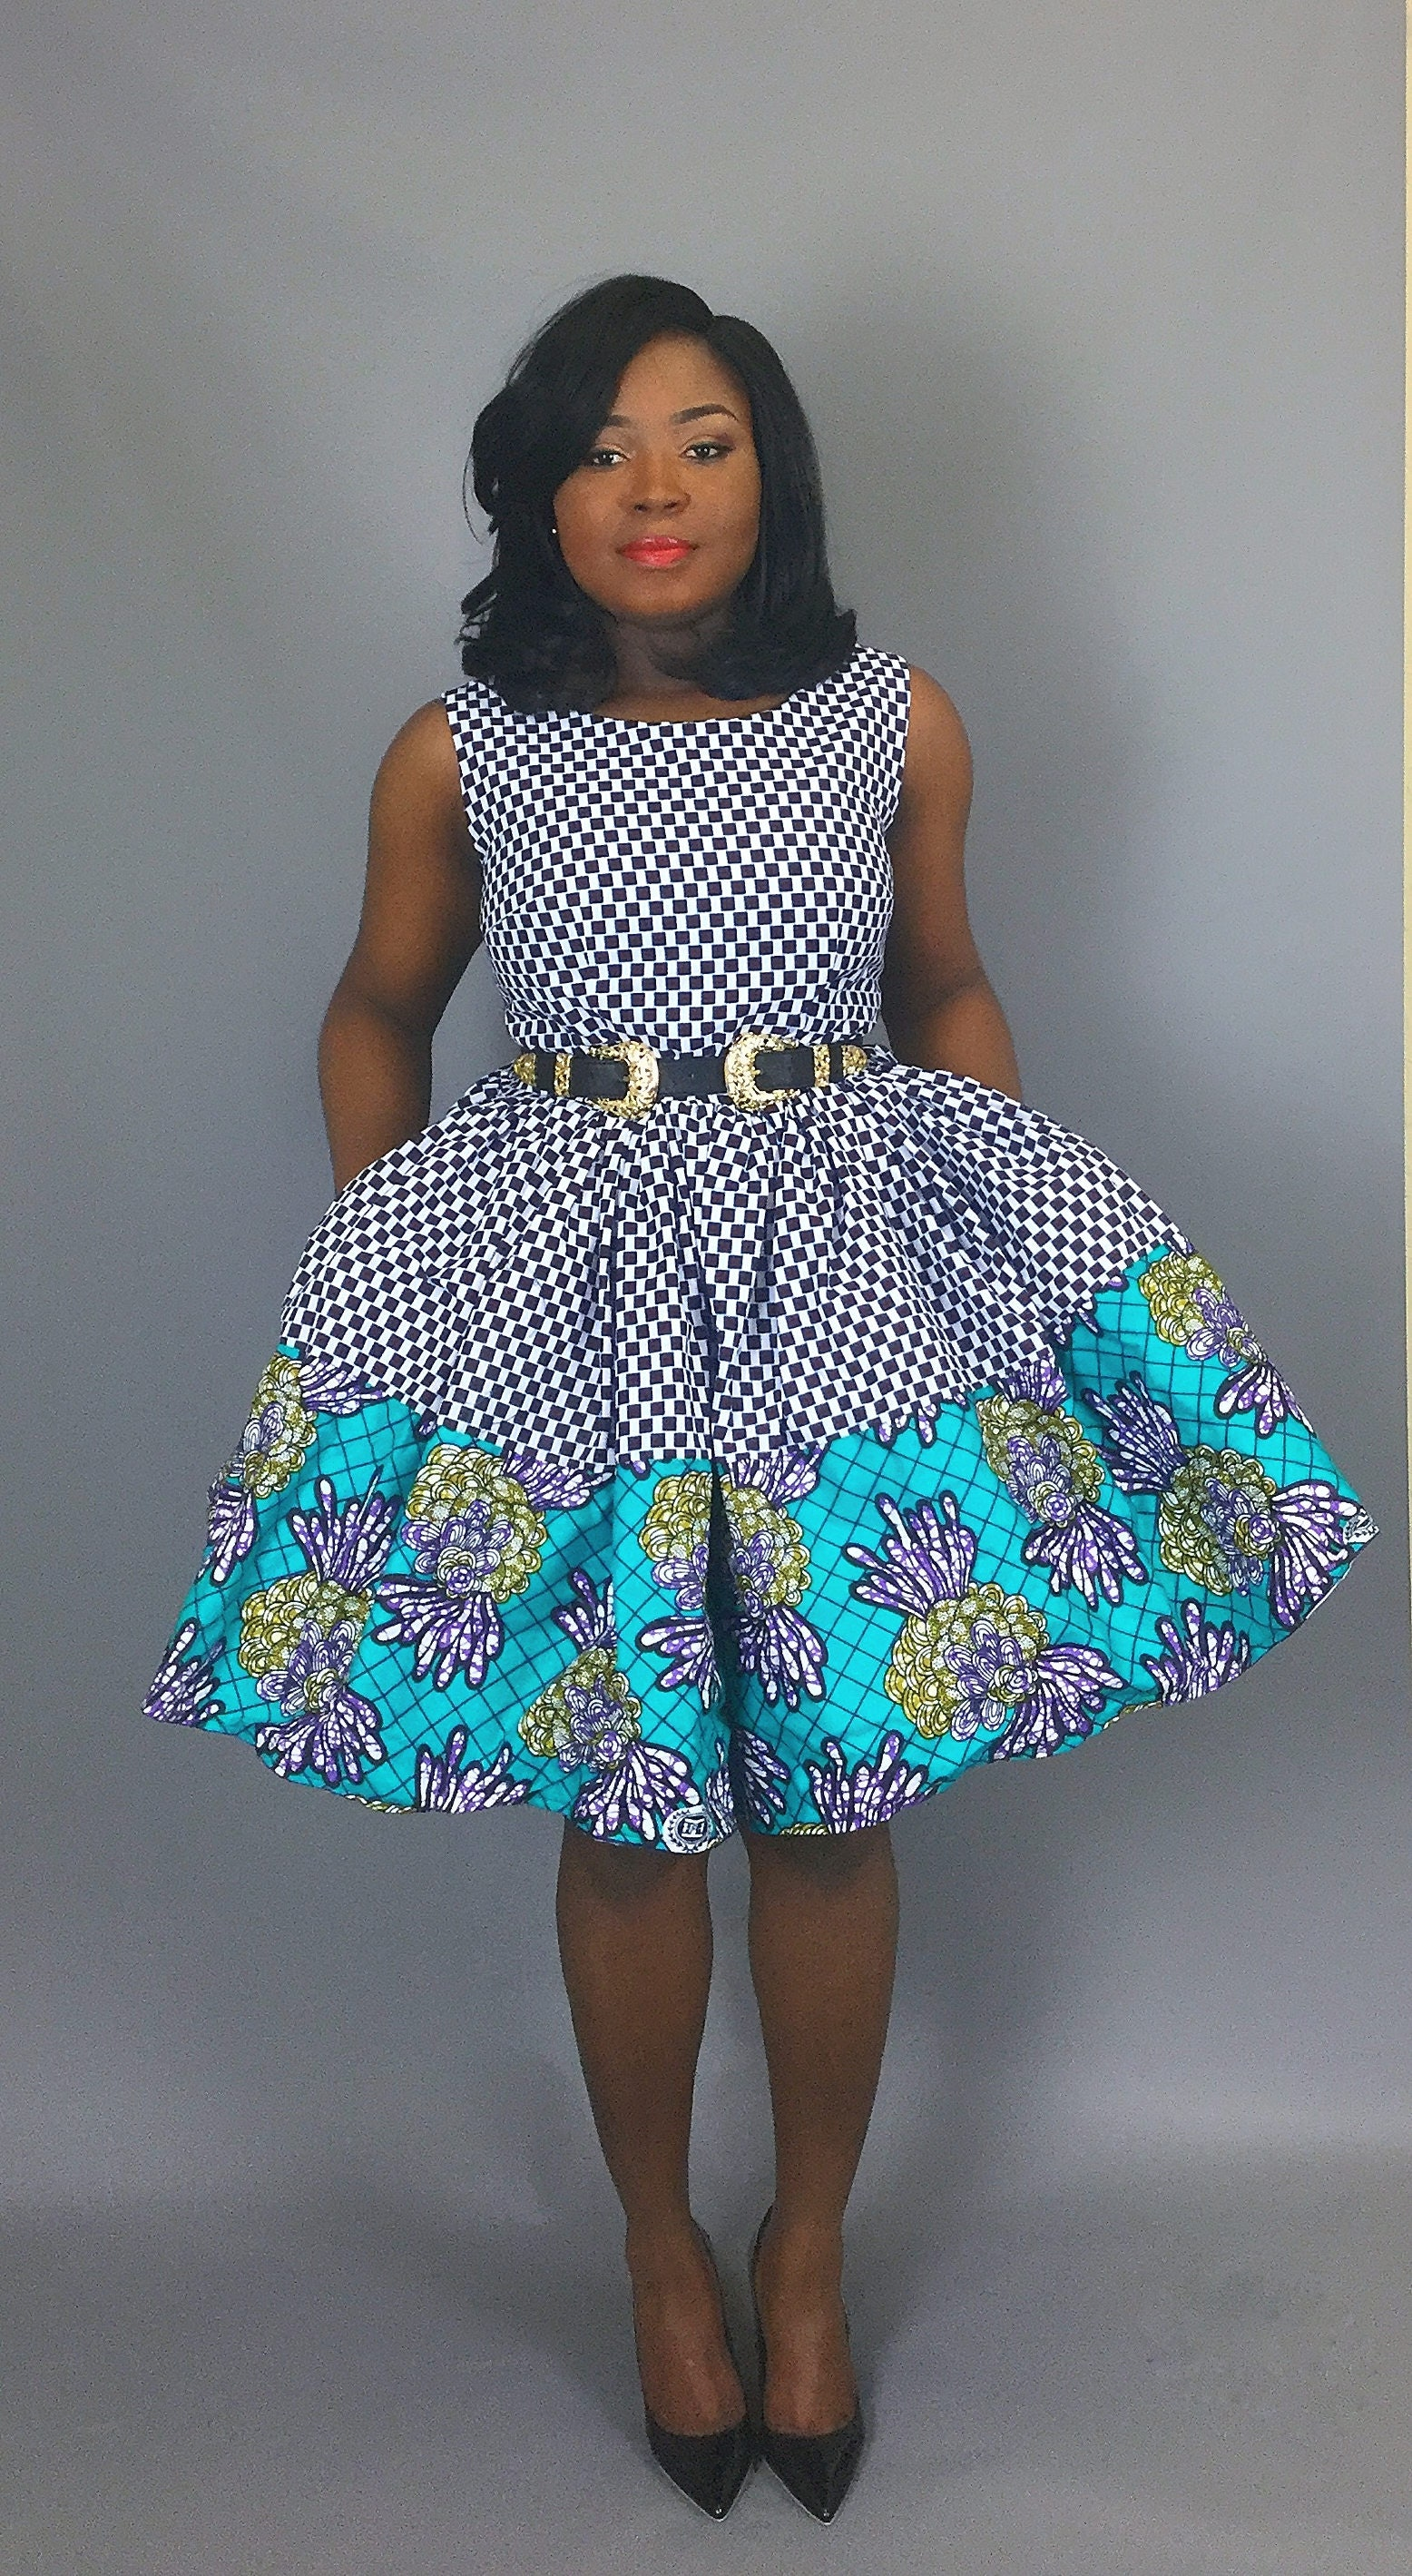 African mixed print cocktail dressAfrican clothingAfrican wax printdresseswomens clothingAfrican clothingdashikimaxi skirtsmini